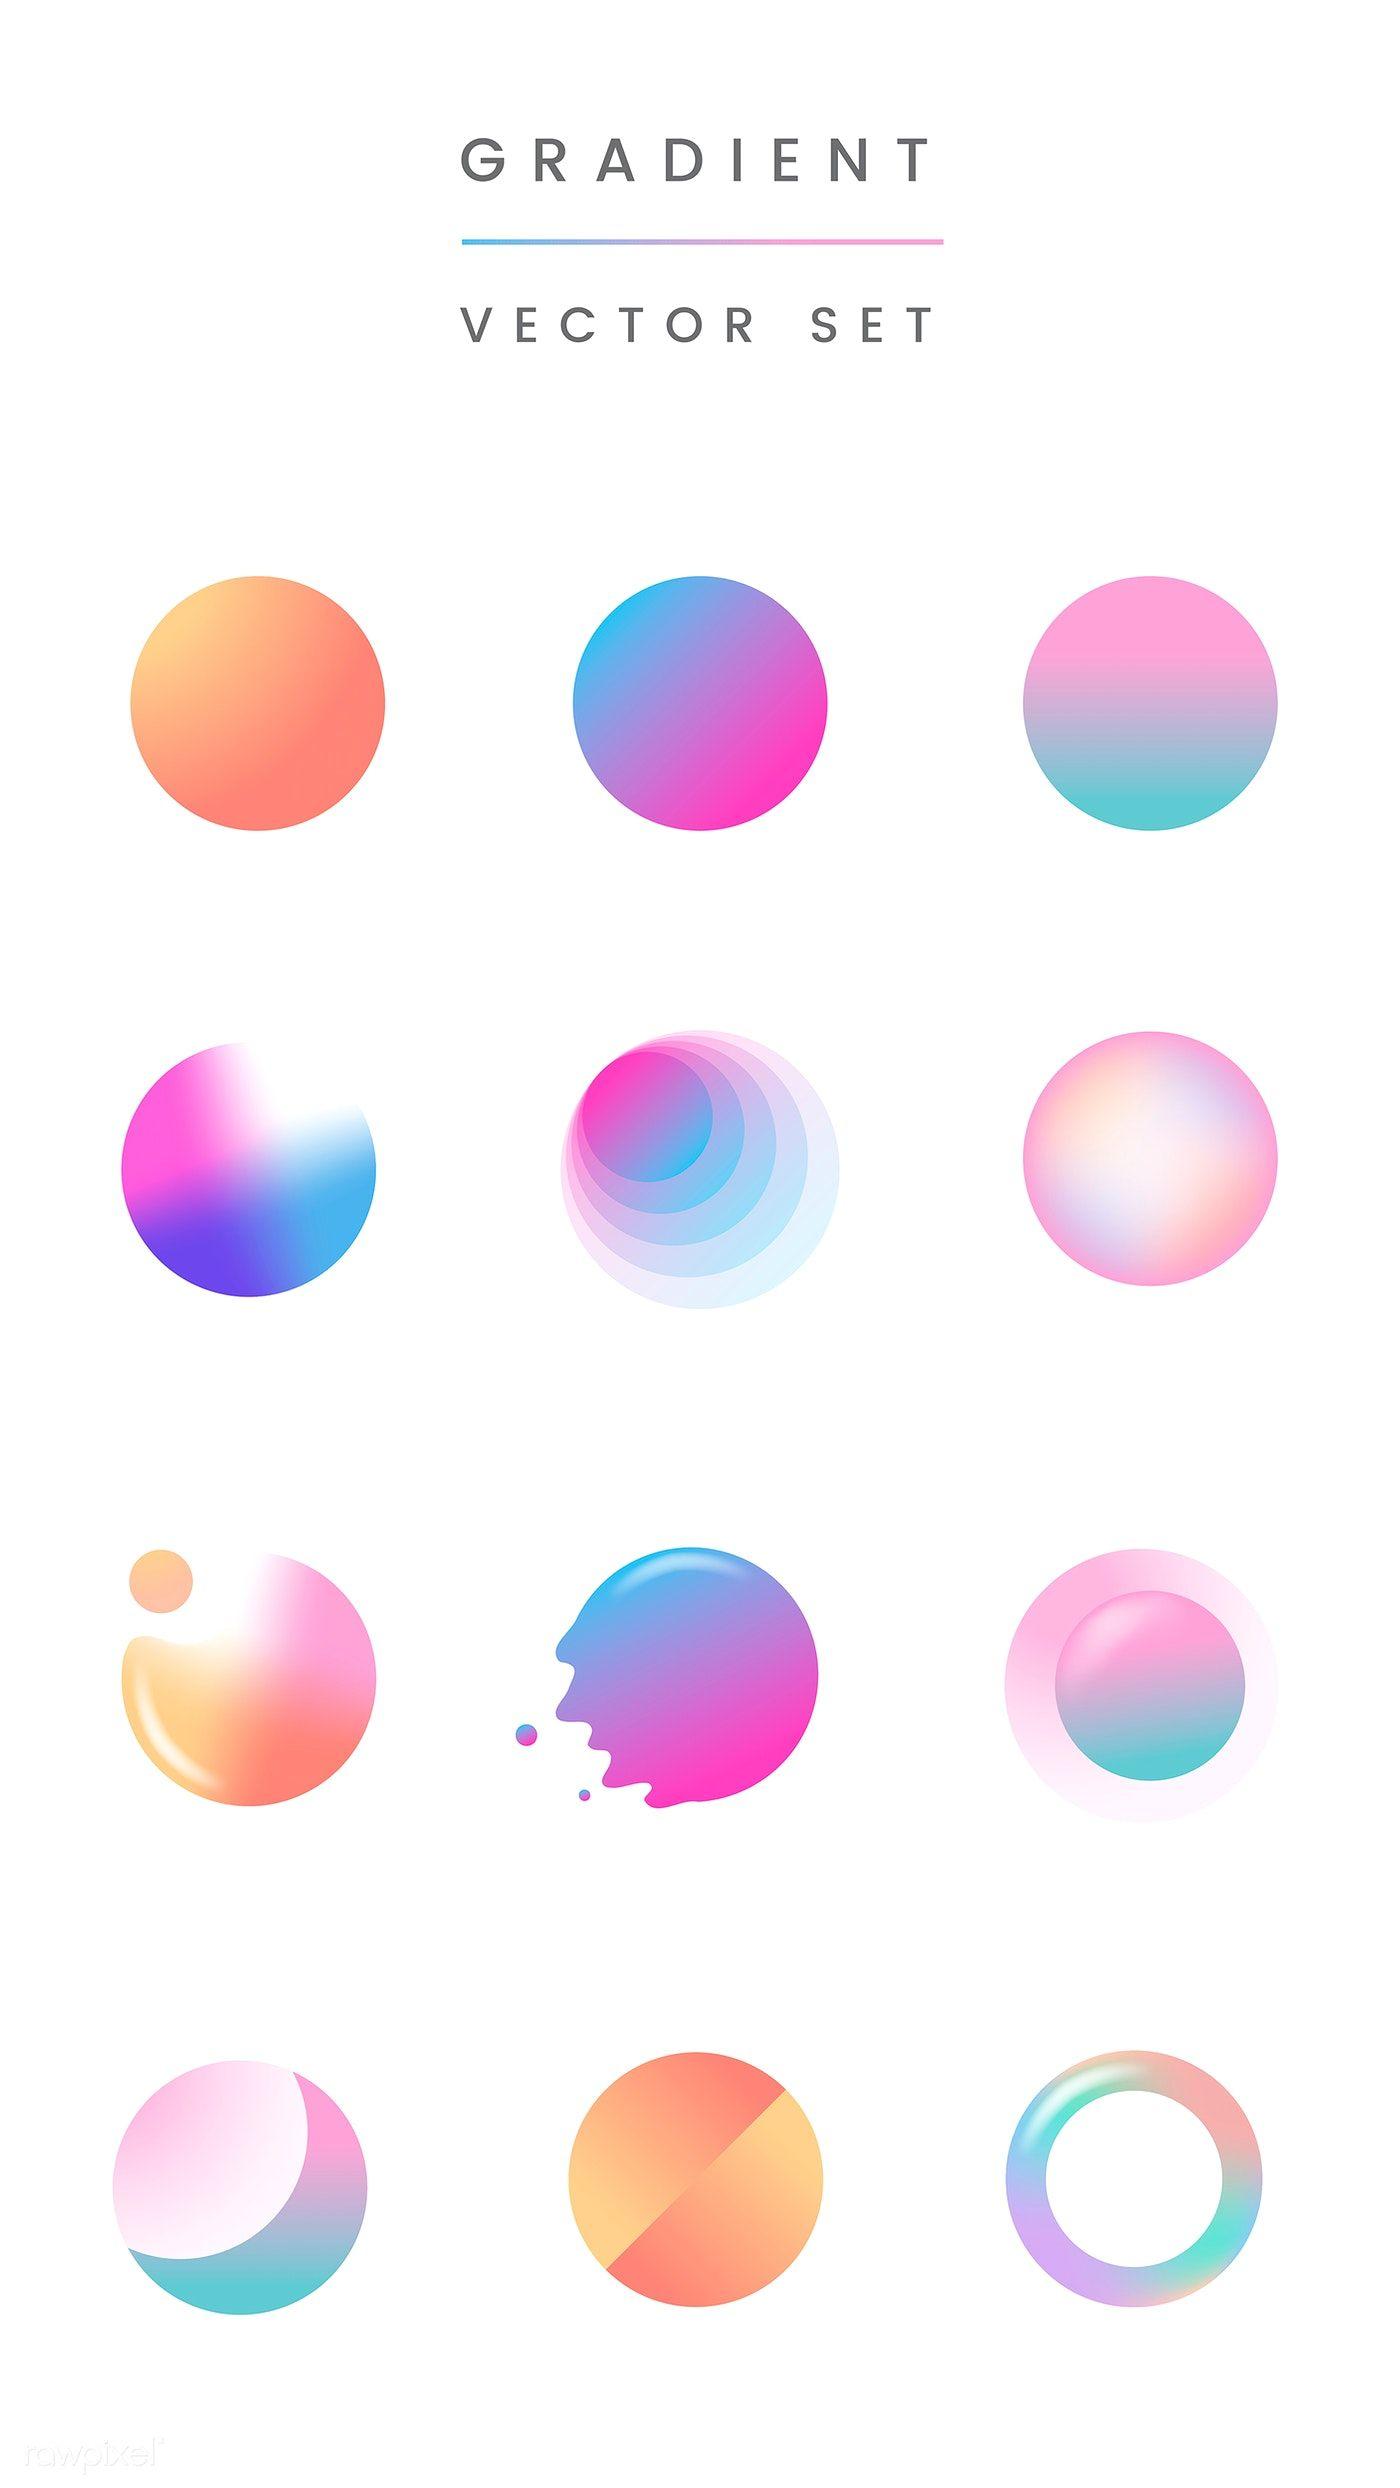 Design Trends Premium Psd Vector Downloads: Download Premium Illustration Of Colorful Gradient Badge Vector Set 894015